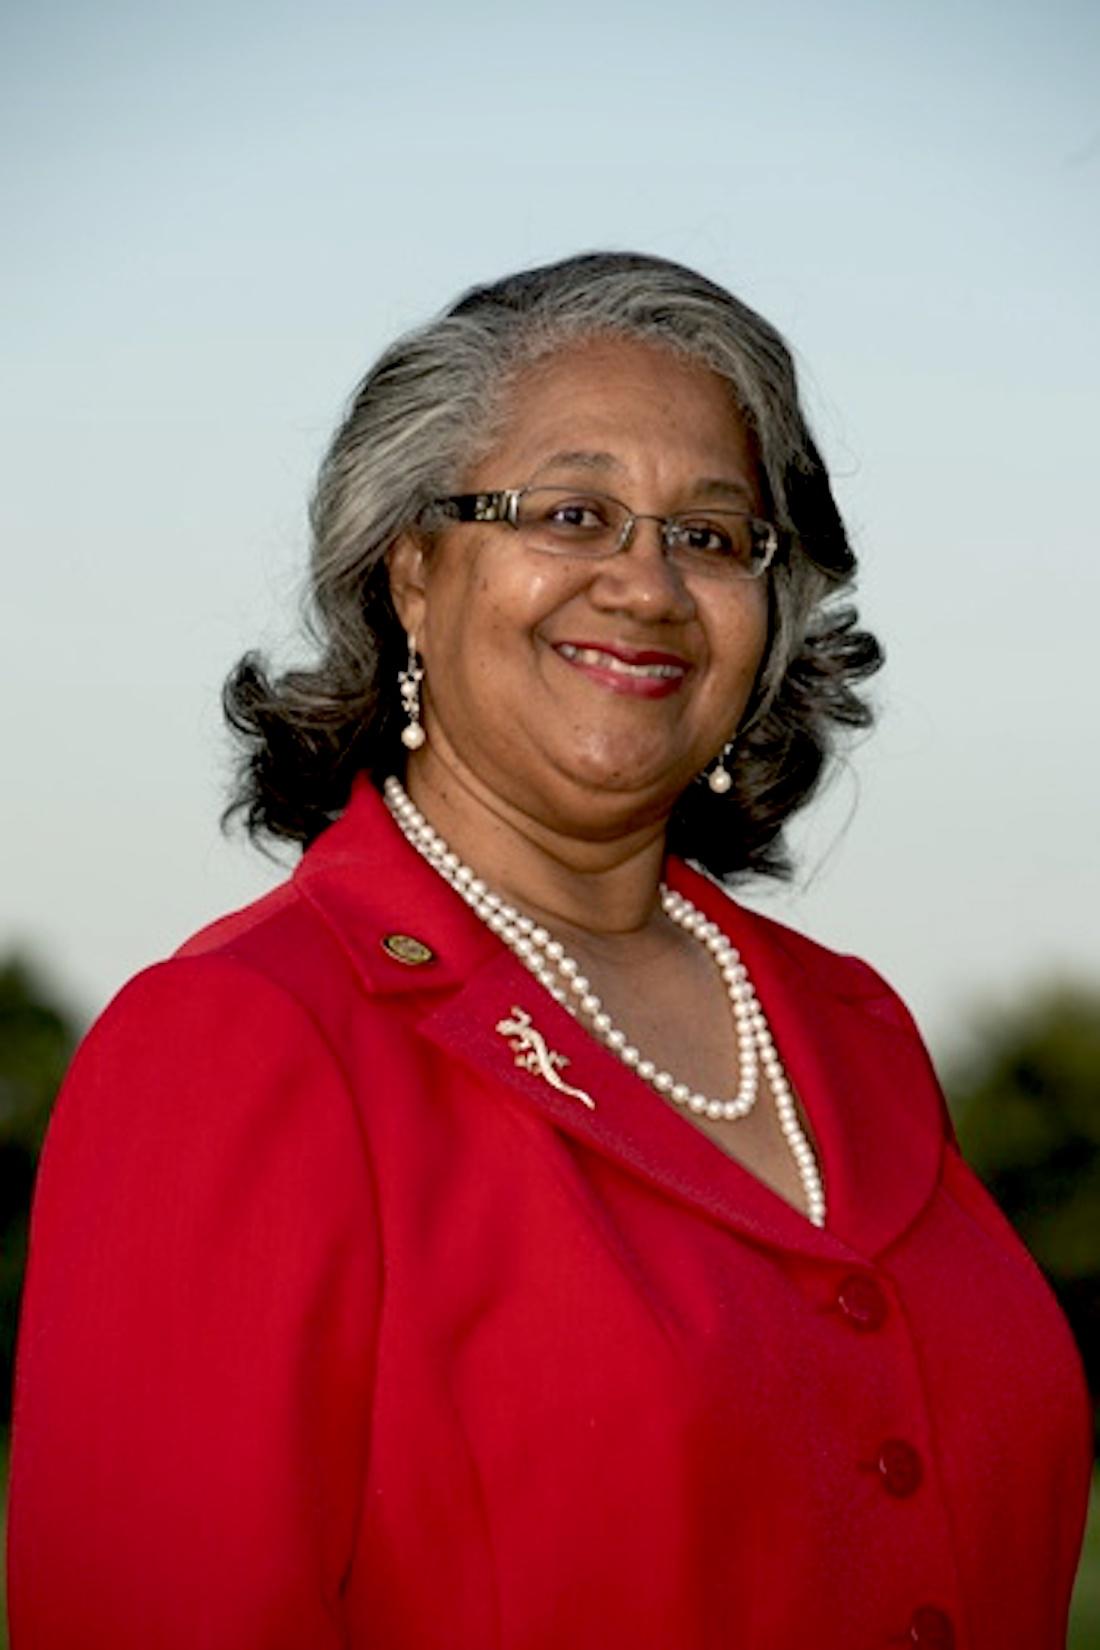 Cheryl D Glenn, Willoughby Avenue, The Five Fifths, KOLUMN Magazine, KOLUMN, African American Politics, Black in Politics